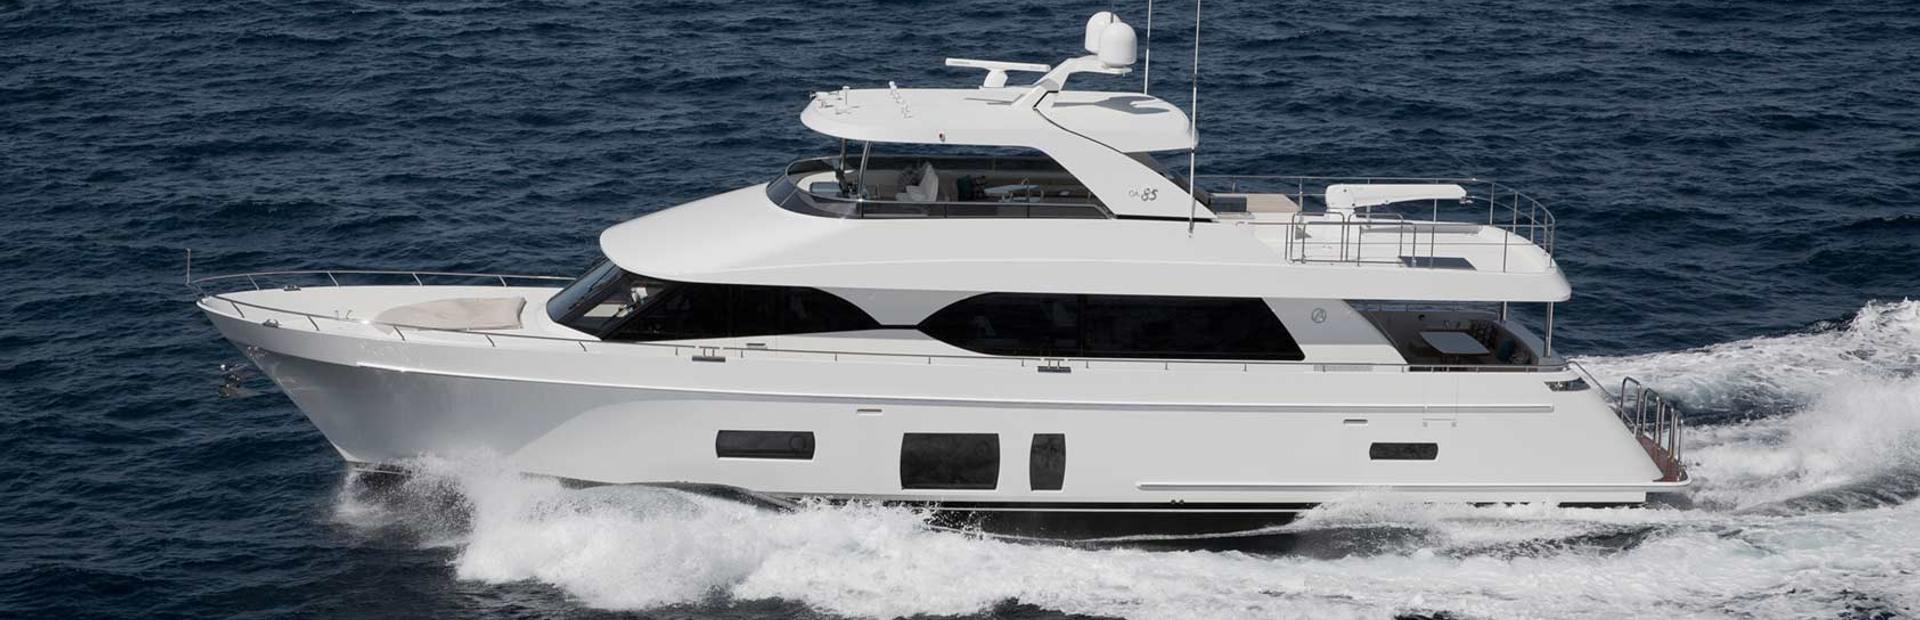 85 Motoryacht Yacht Charter